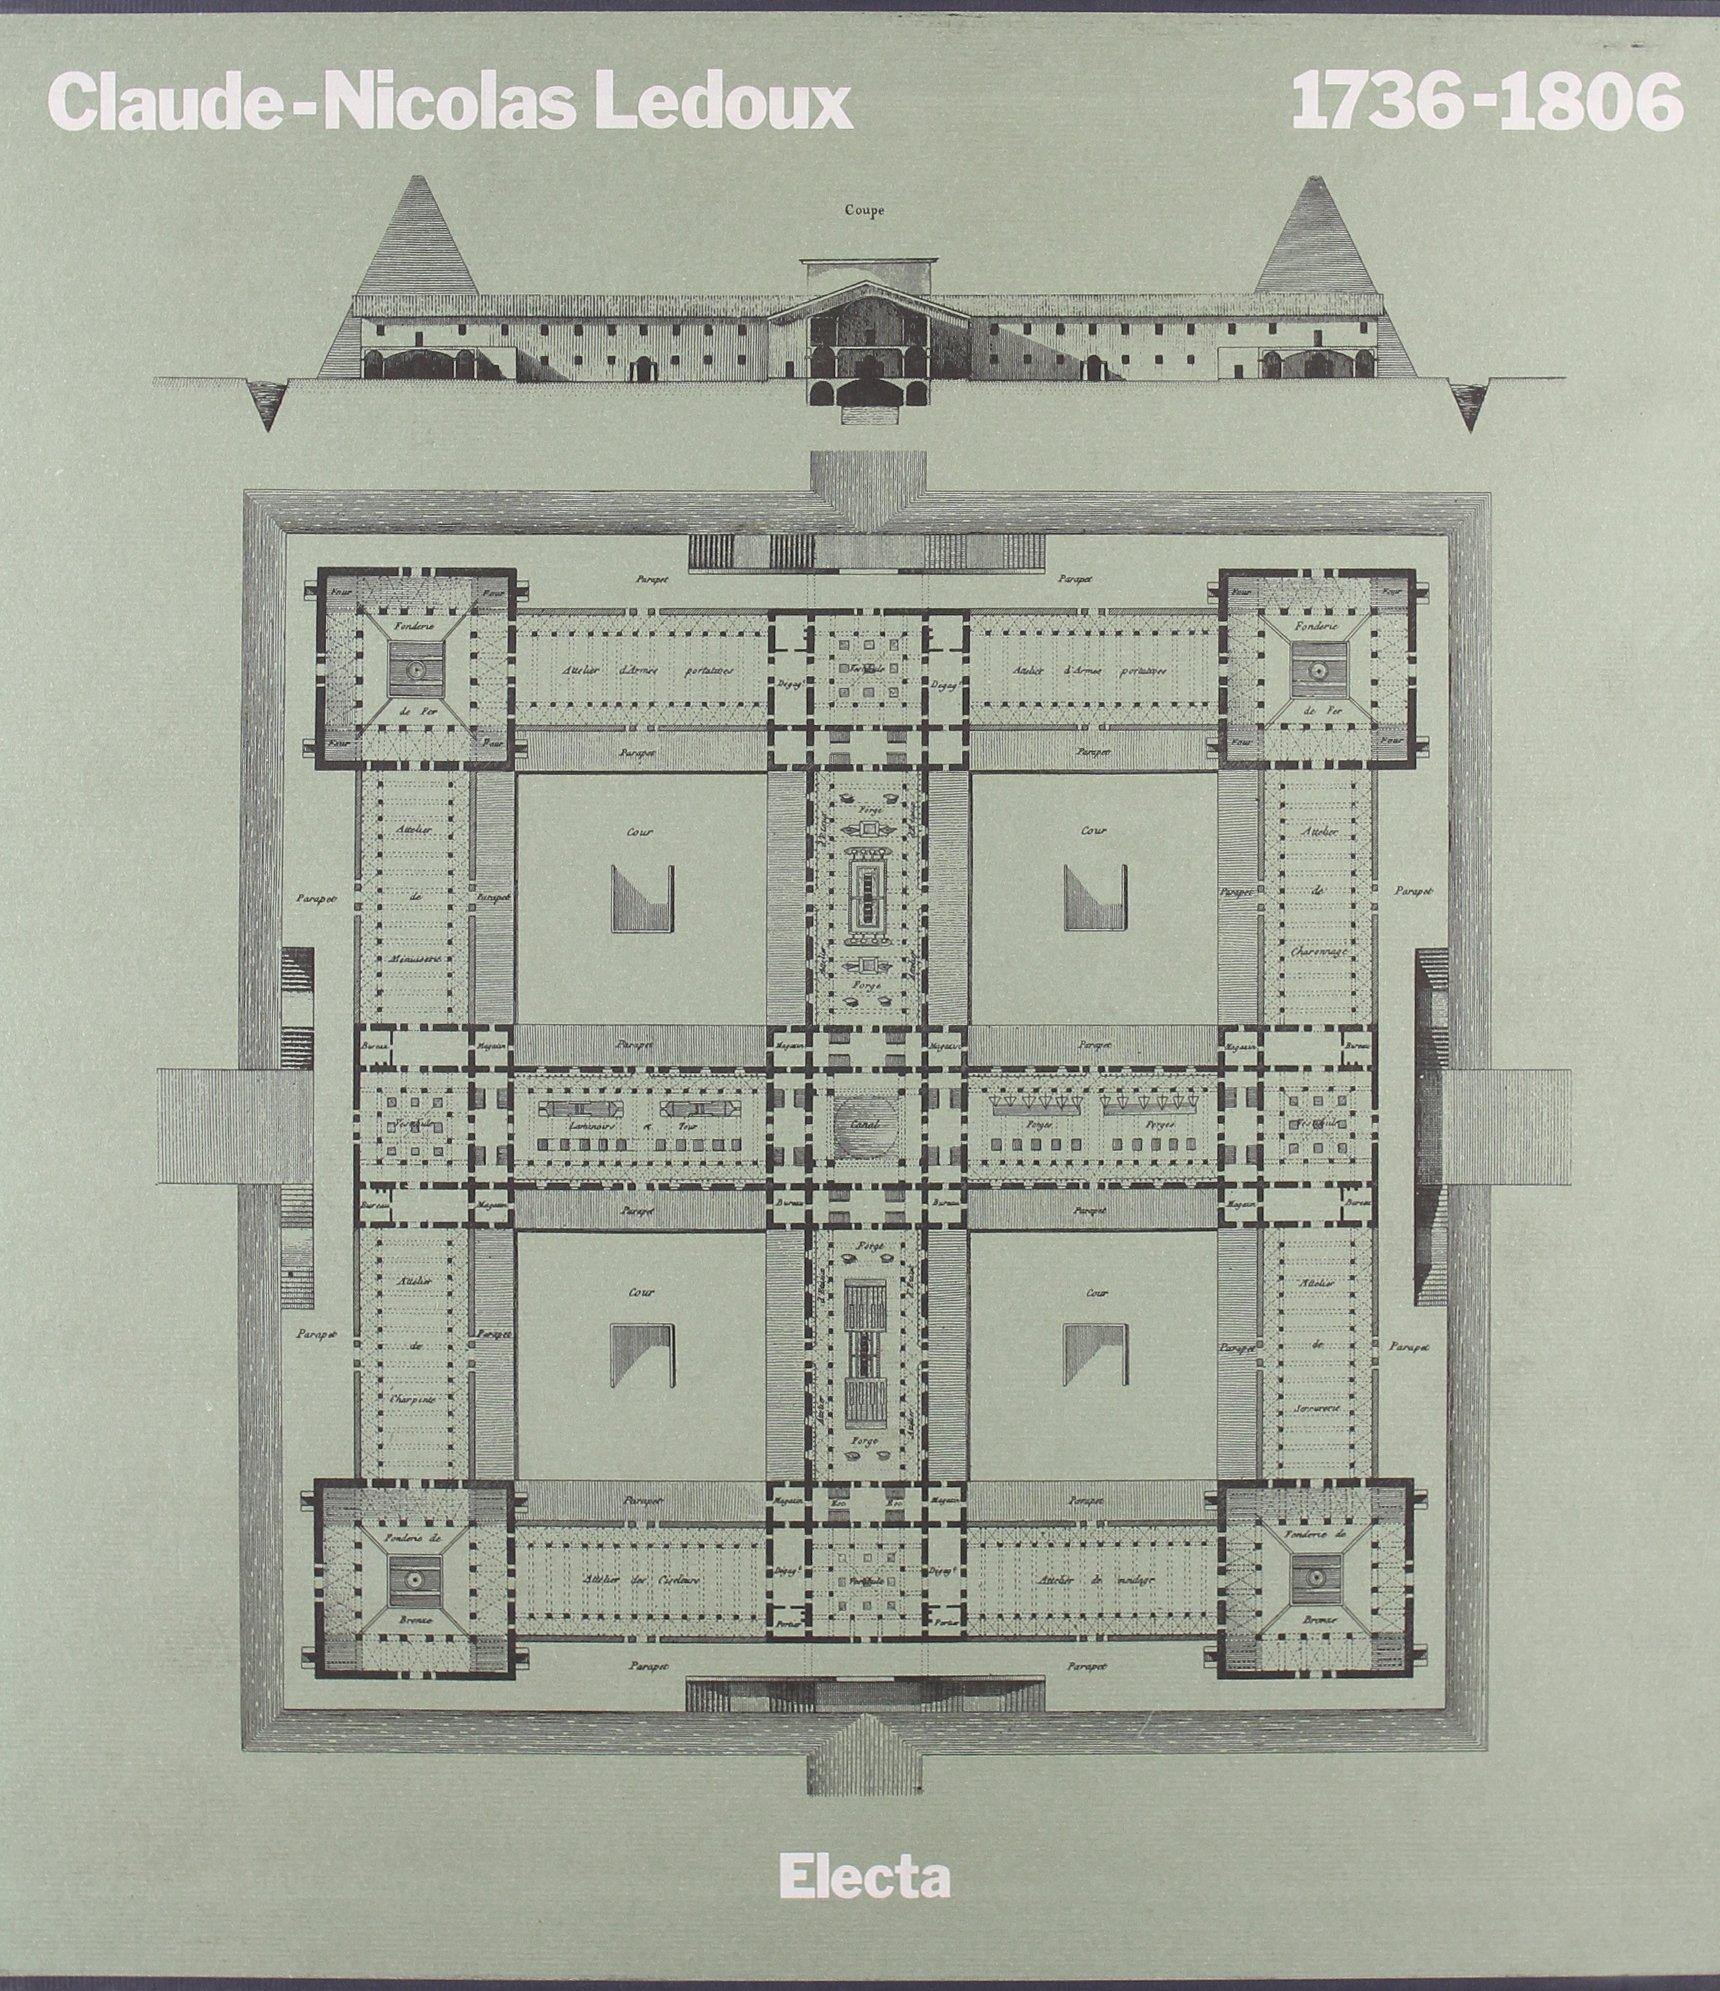 Claude-Nicolas Ledoux (1736-1806). Ediz. illustrata Copertina rigida – 1 gen 1997 Anthony Vidler M. Parizzi Mondadori Electa 884354683X